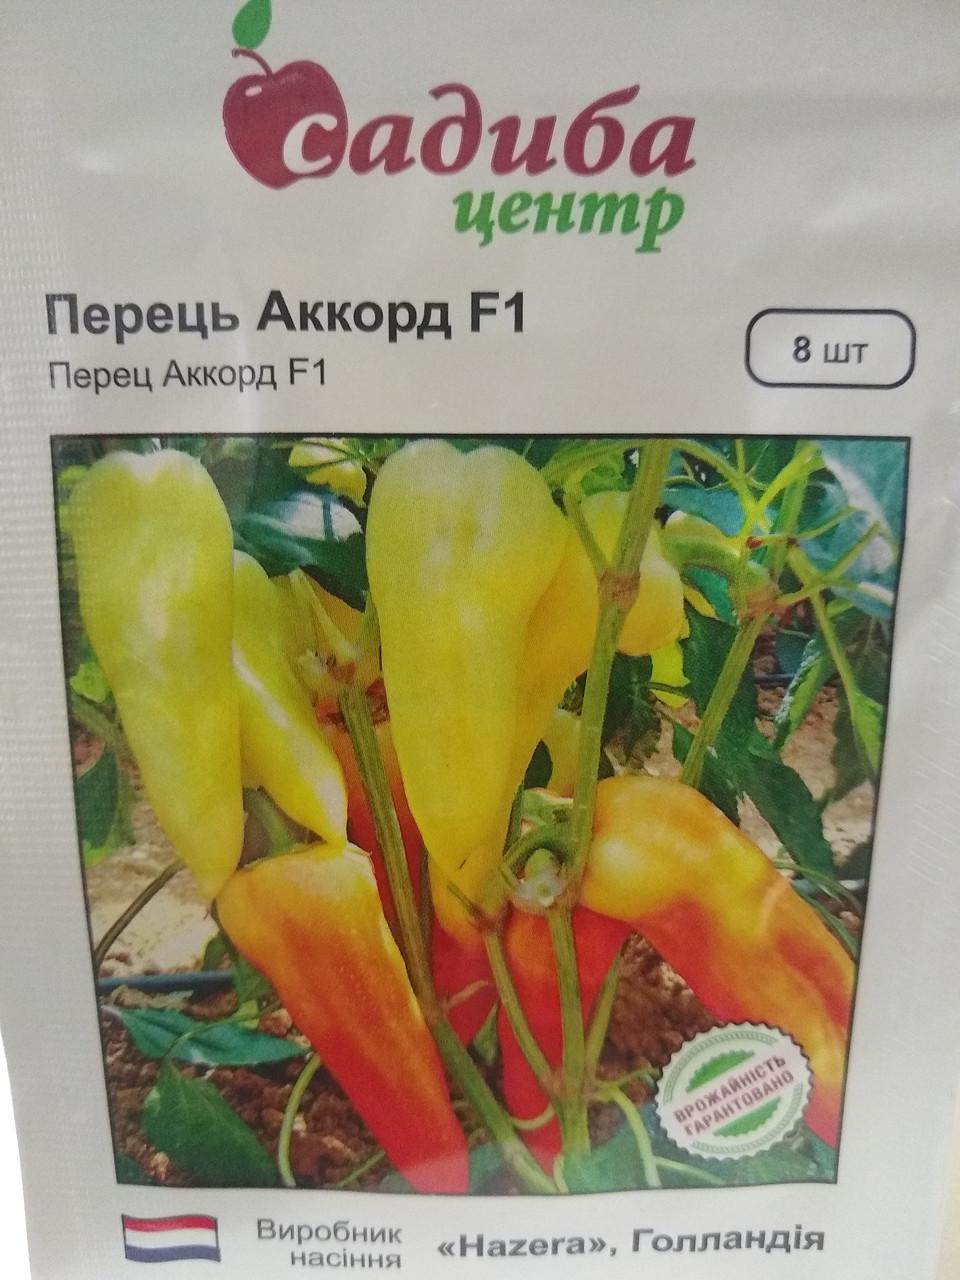 Семена раннего перца сладкого Аккорд F1 венгерского типа для свежего рынка 8 семян Hazera  Голландия